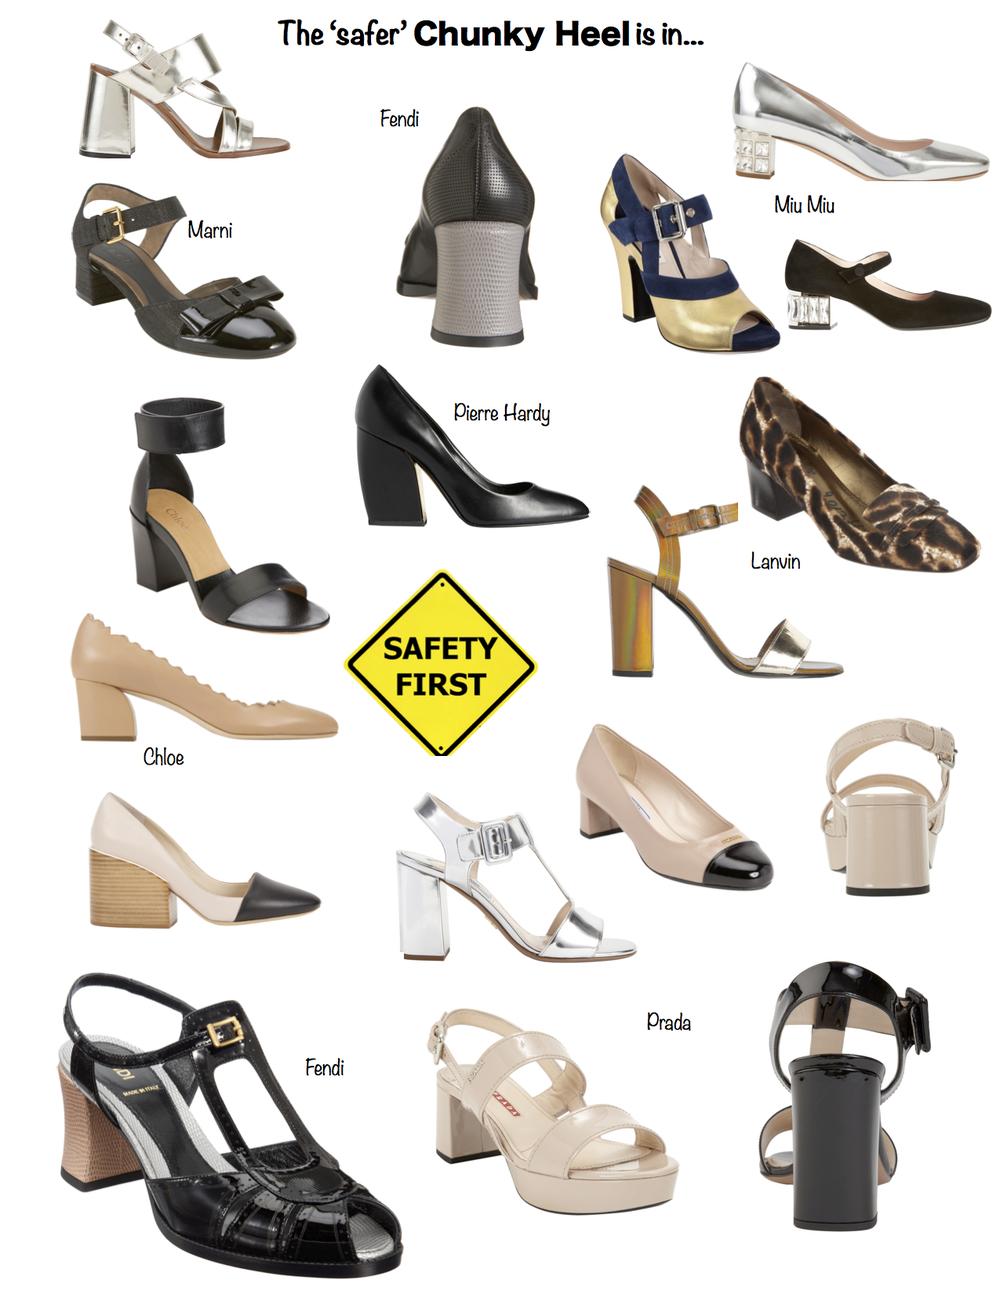 safeshoes.jpg